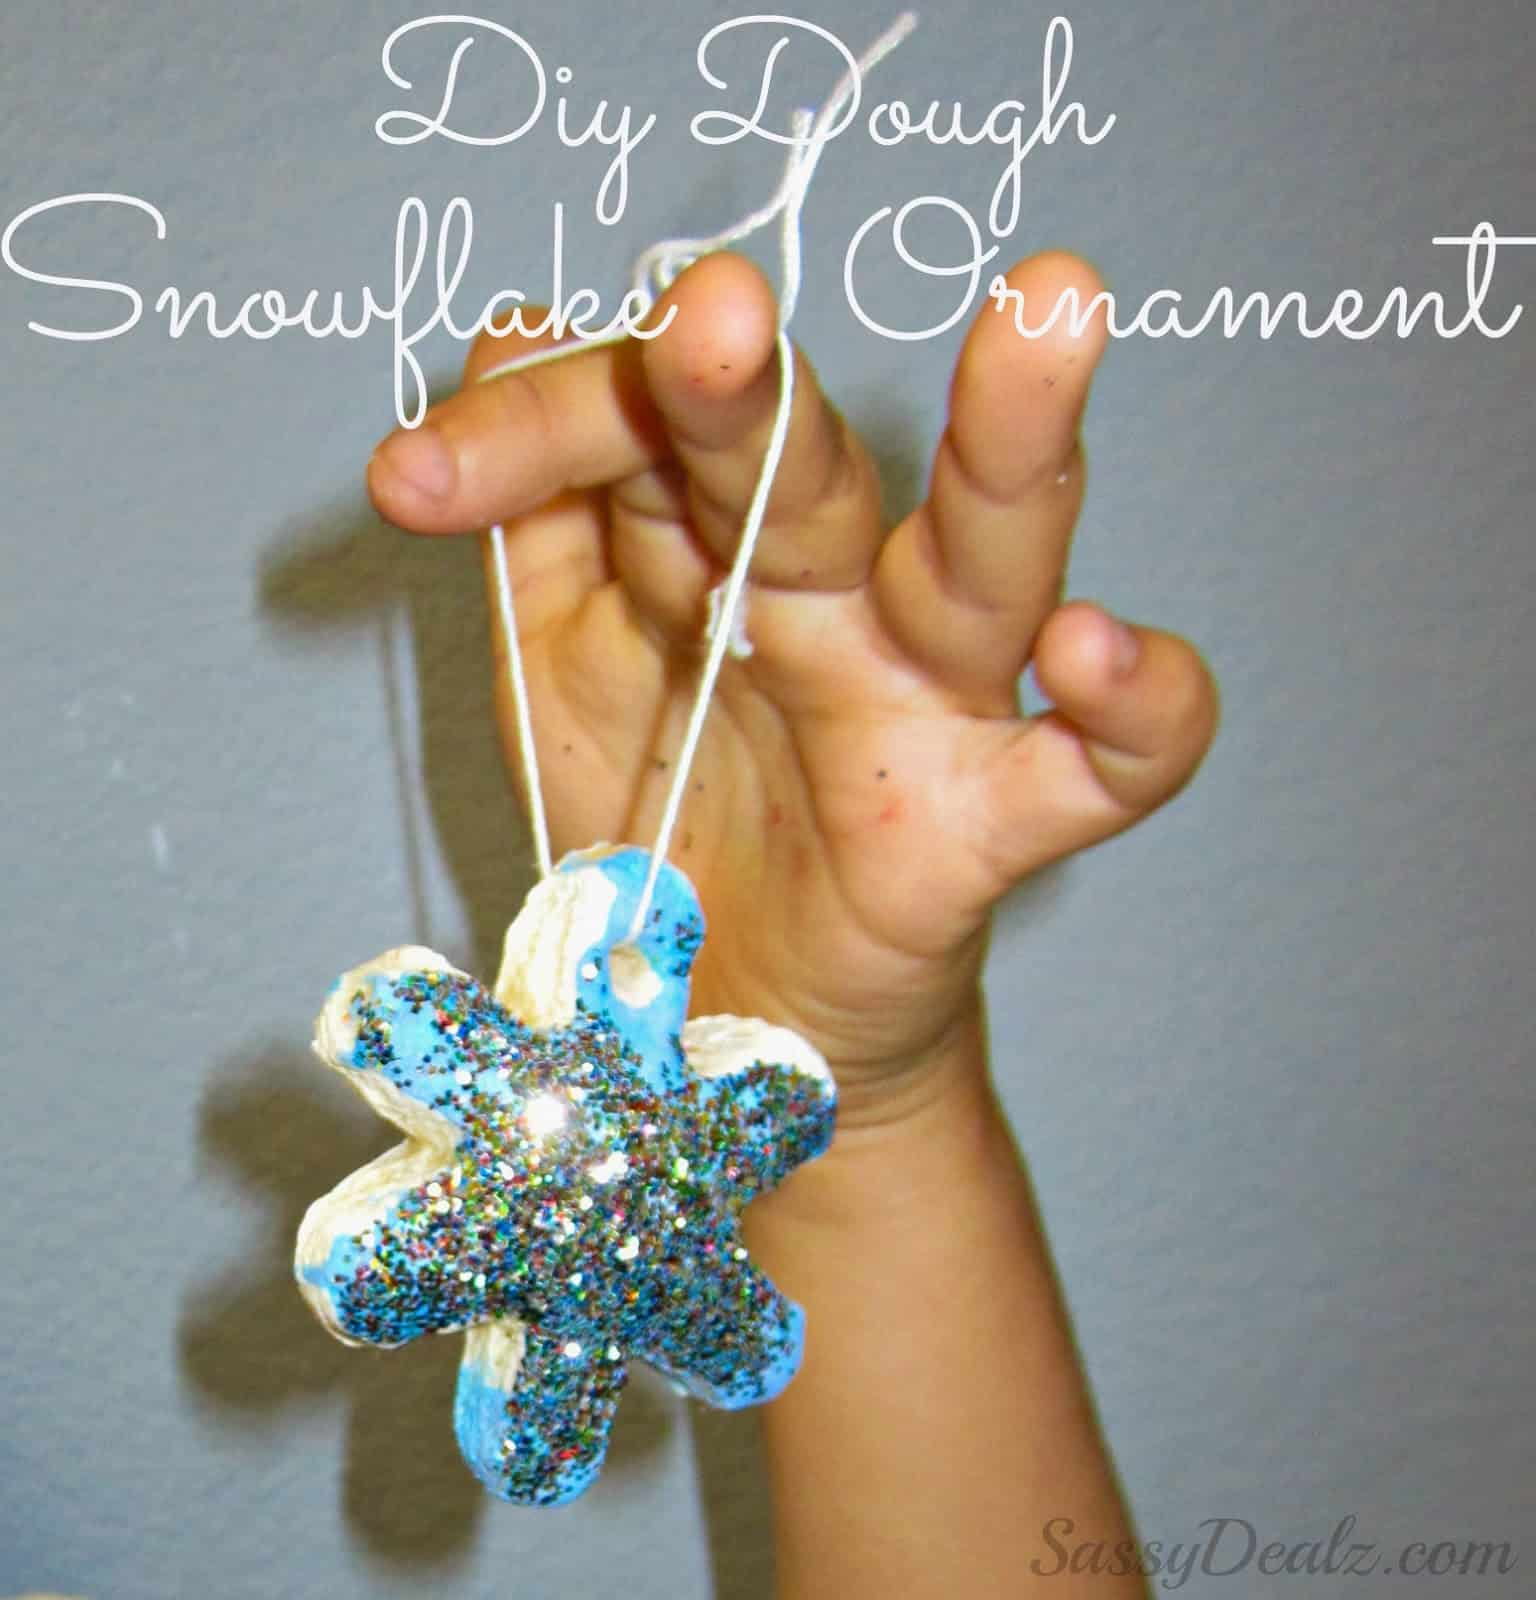 Sparkly salt dough snowflake ornament